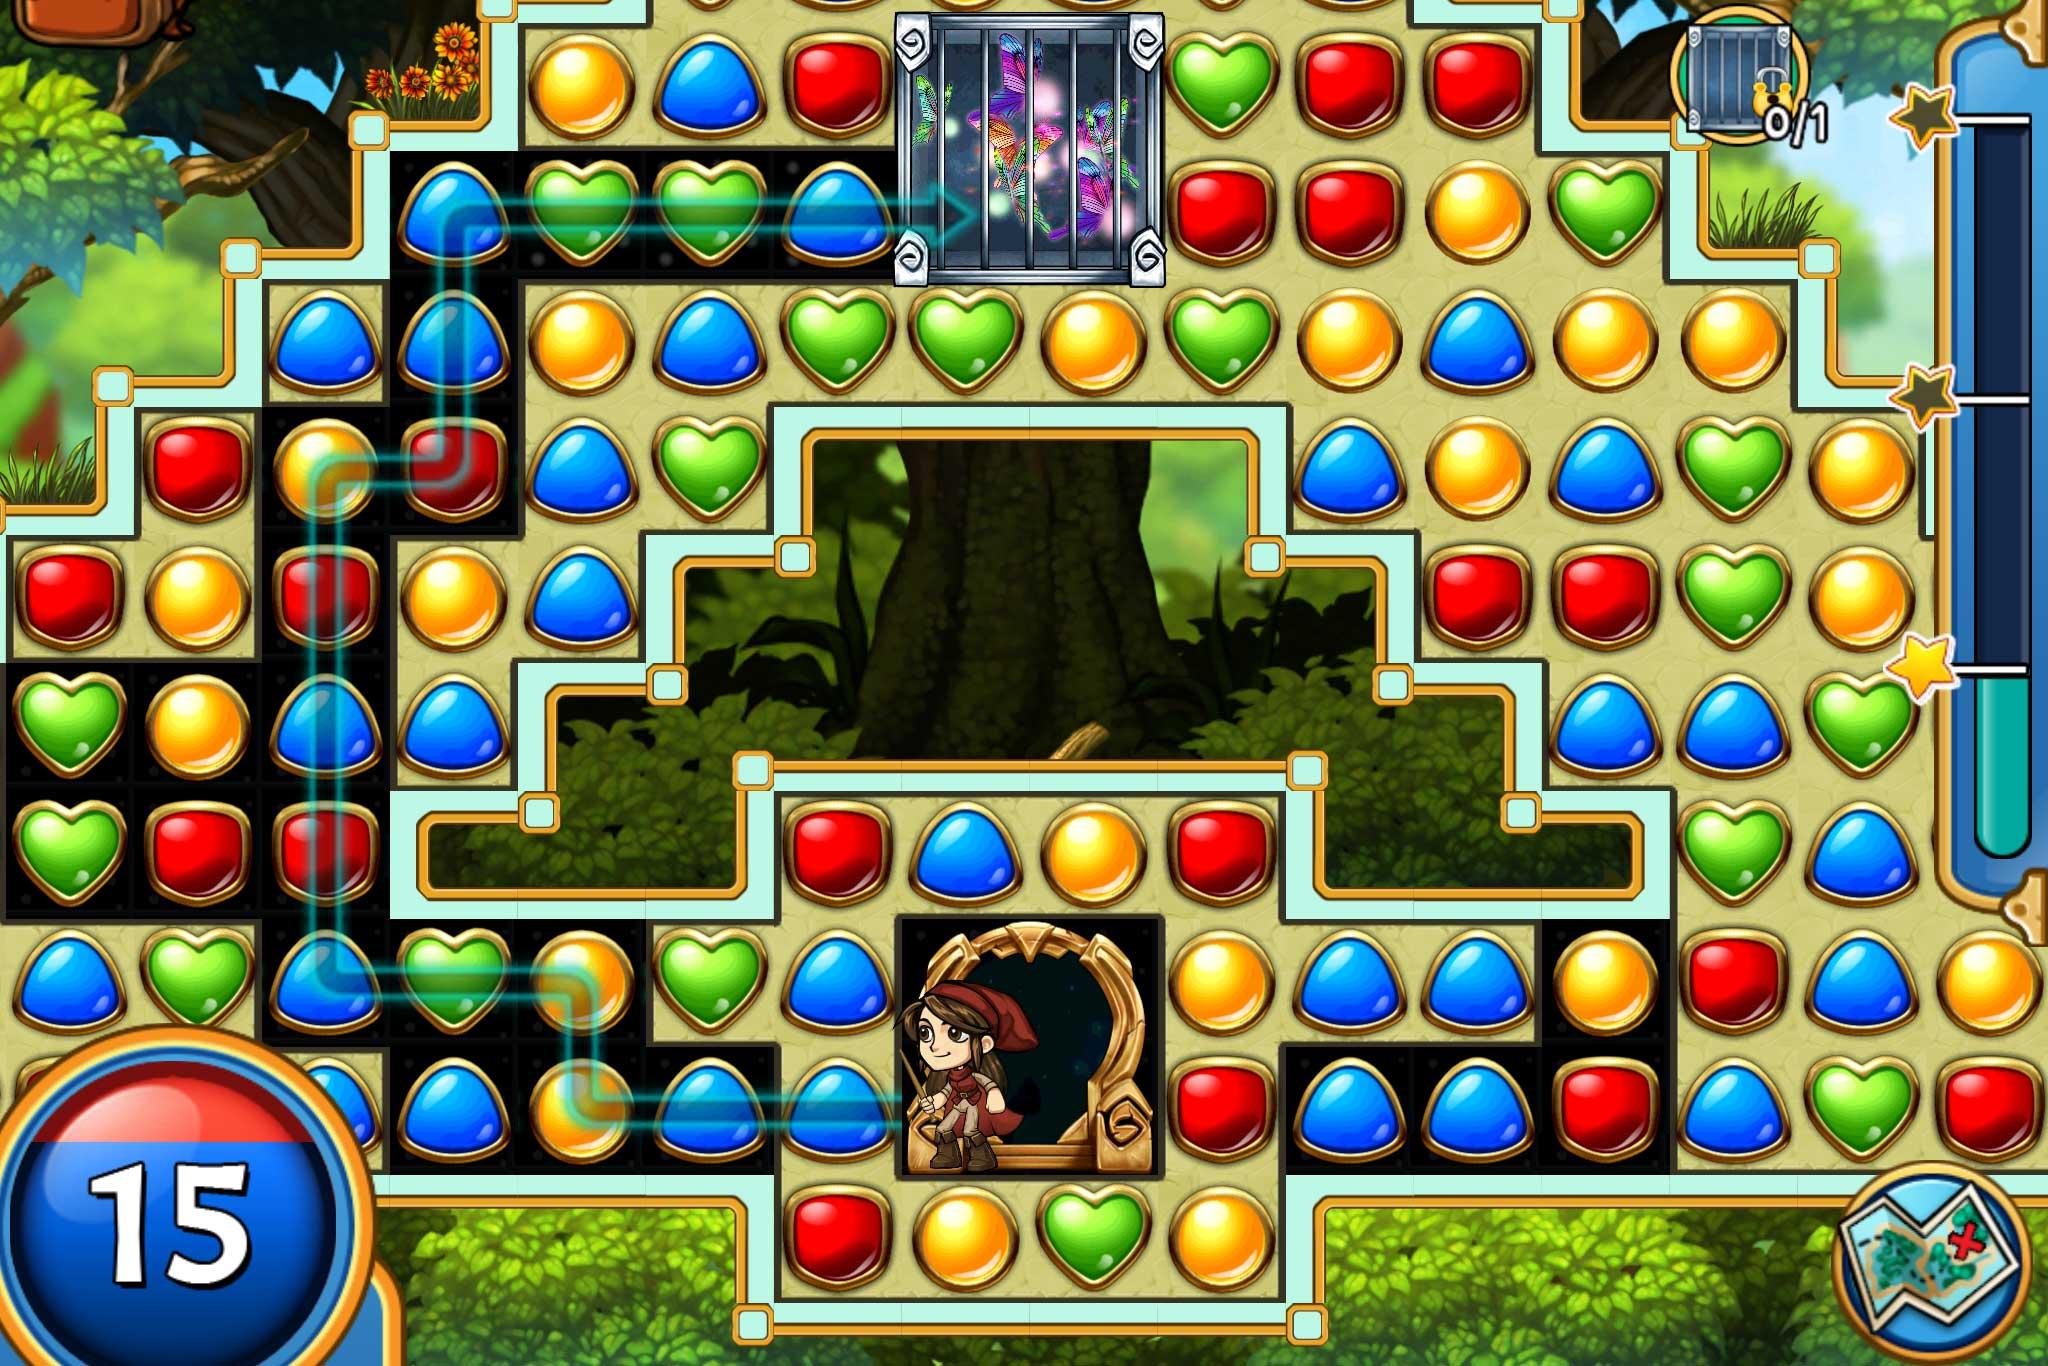 Electronic Arts hopes to jump on the mobile games bandwagon - Peninsula Press